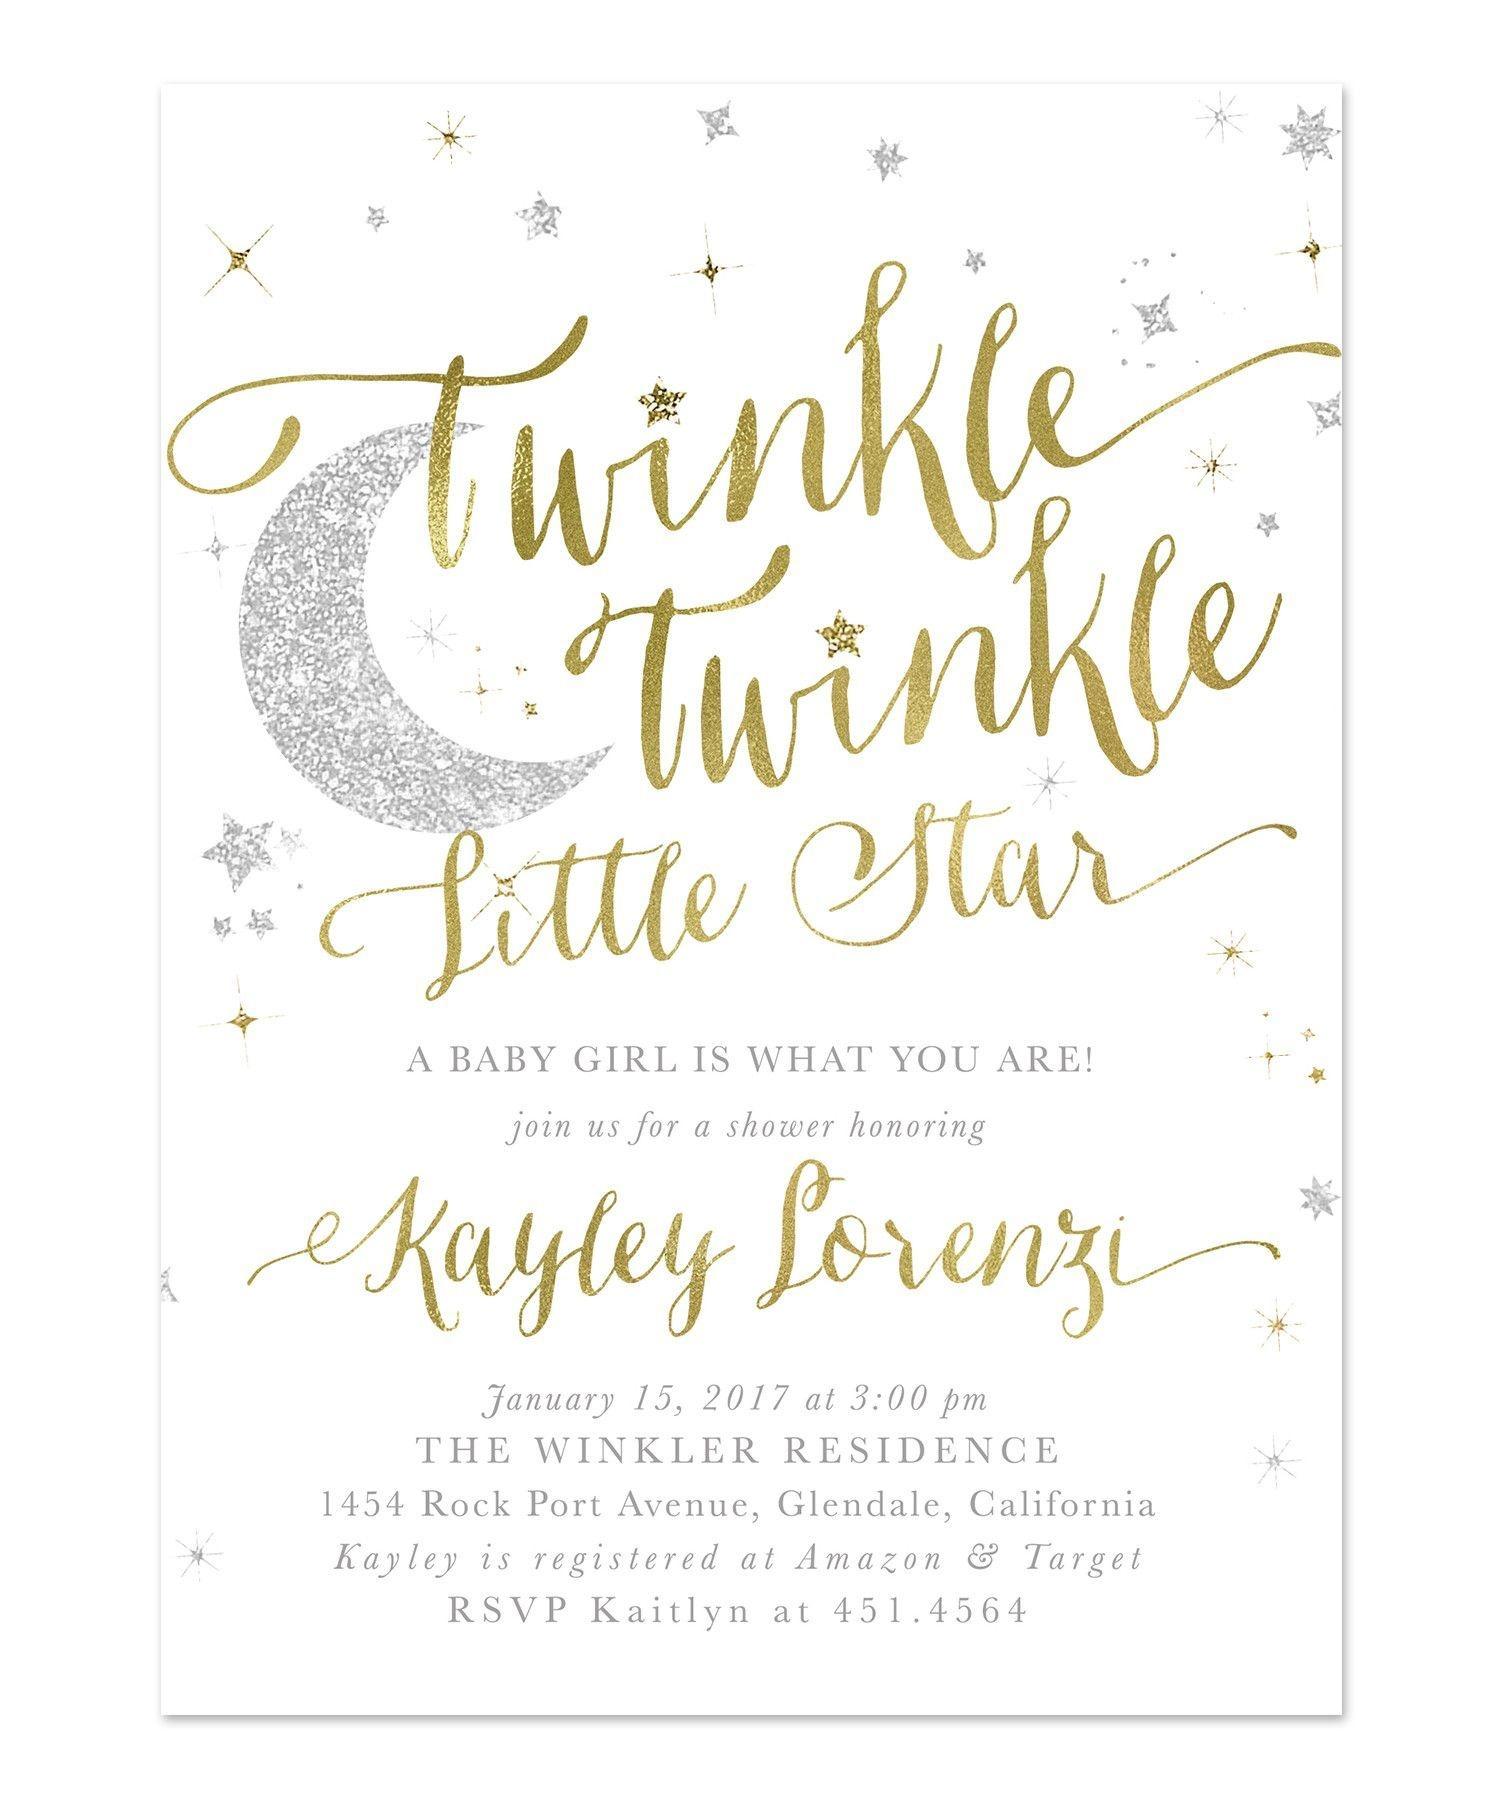 Twinkle Twinkle Little Star Boy Or Girl Baby Shower Invitation - Free Printable Twinkle Twinkle Little Star Baby Shower Invitations